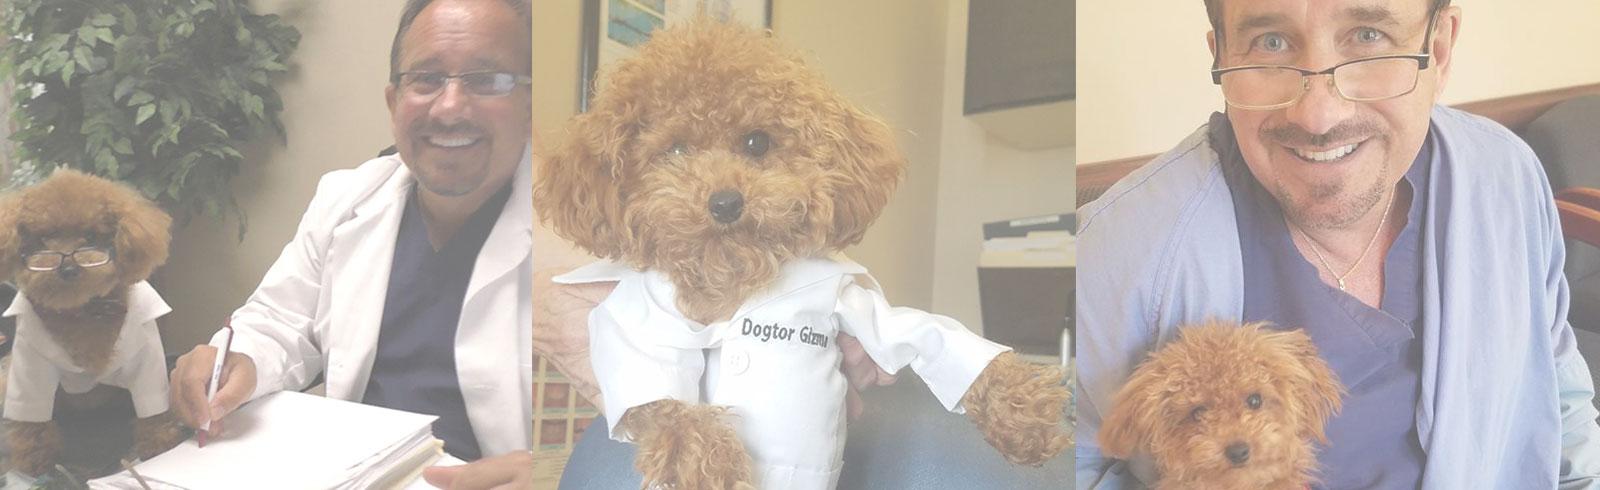 Meet Dogtor Gizmo!